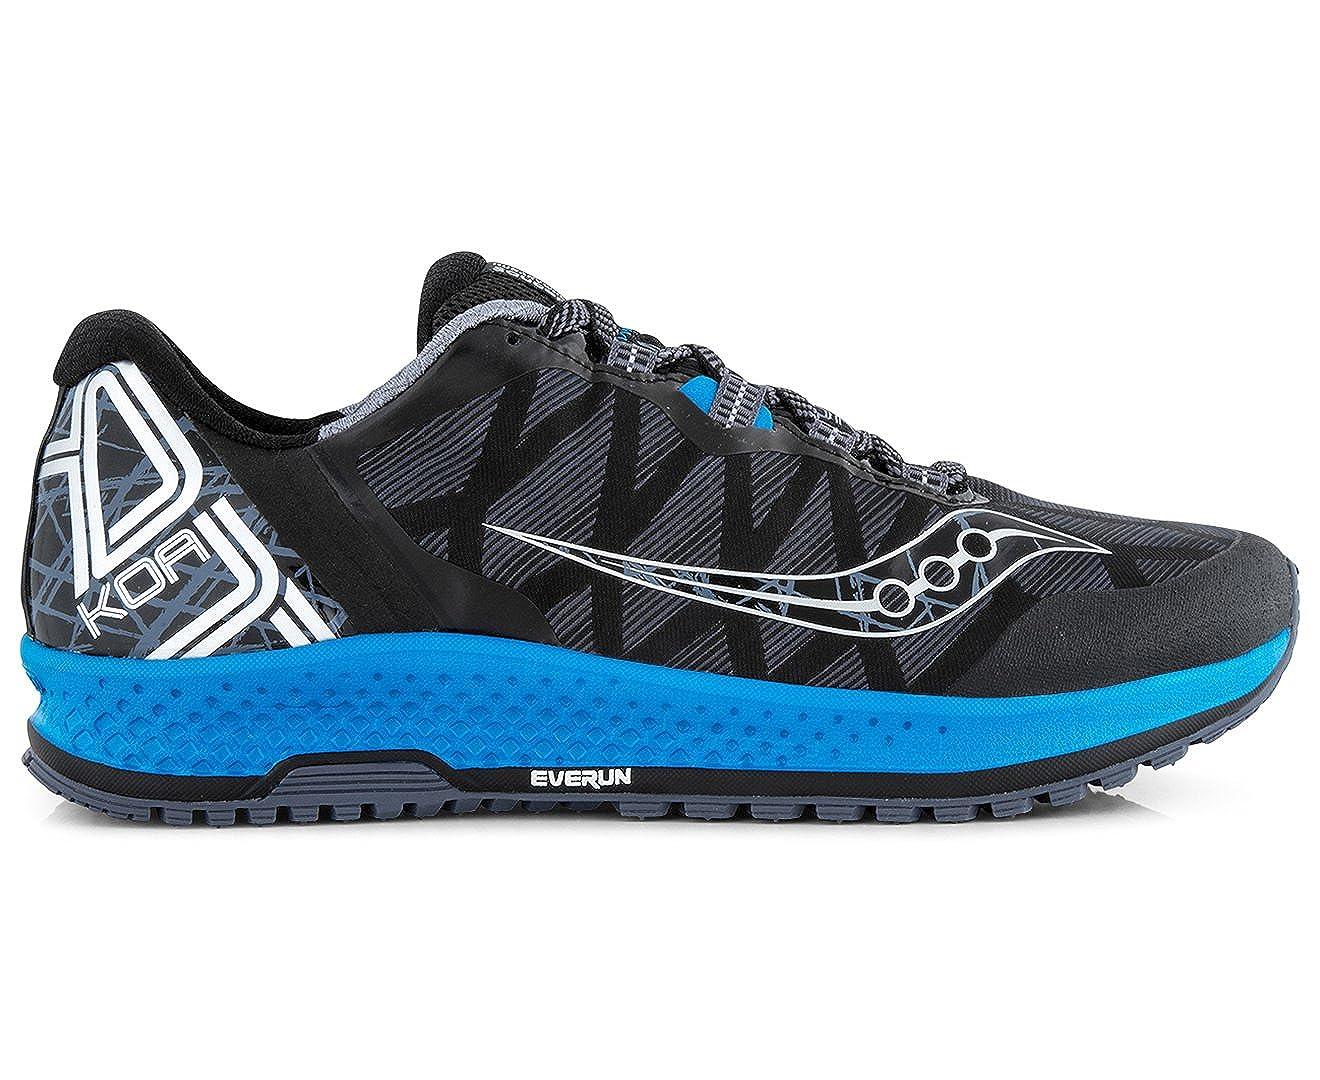 Noir (Blk bleu 4) Saucony Koa TR, Chaussures de Fitness Homme 45 EU